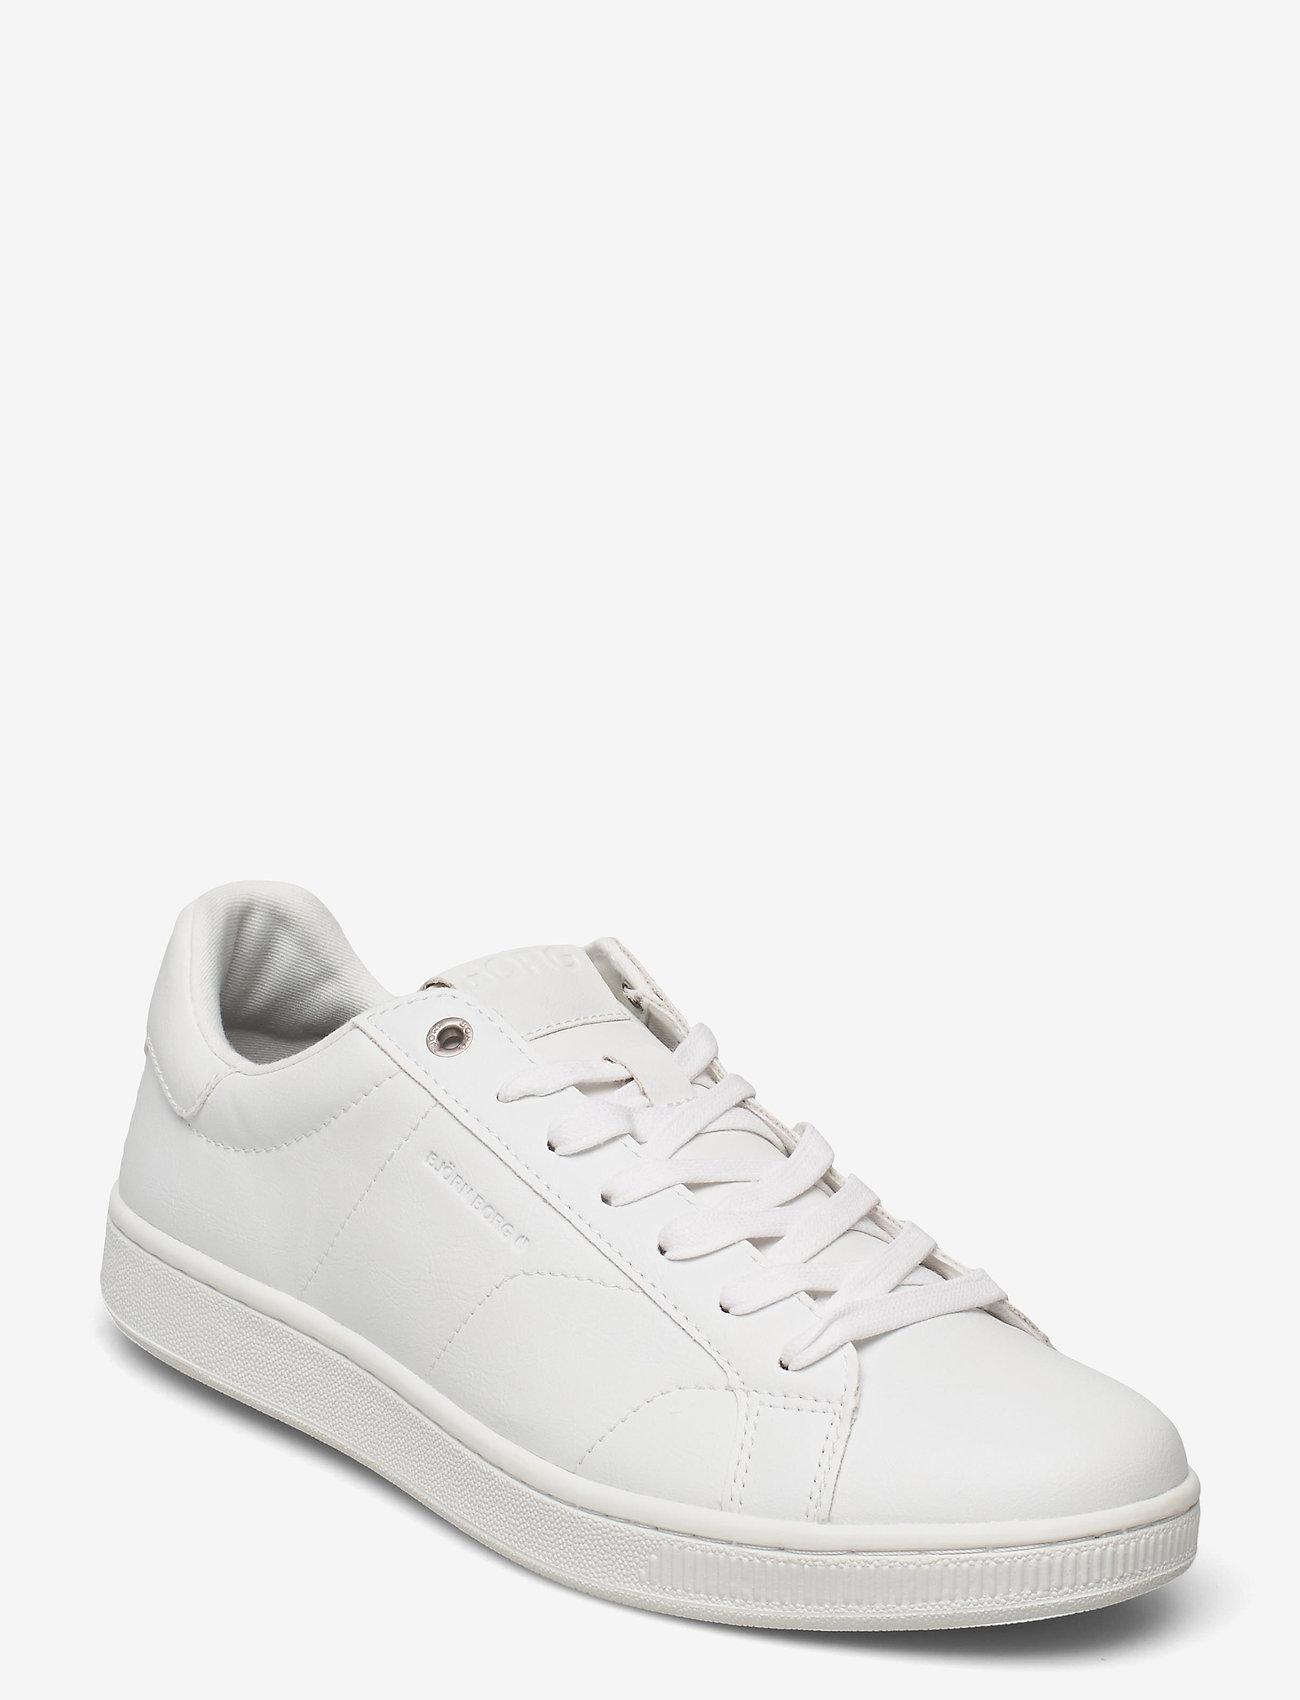 Björn Borg - T305 CLS BTM M - laag sneakers - white/white - 0